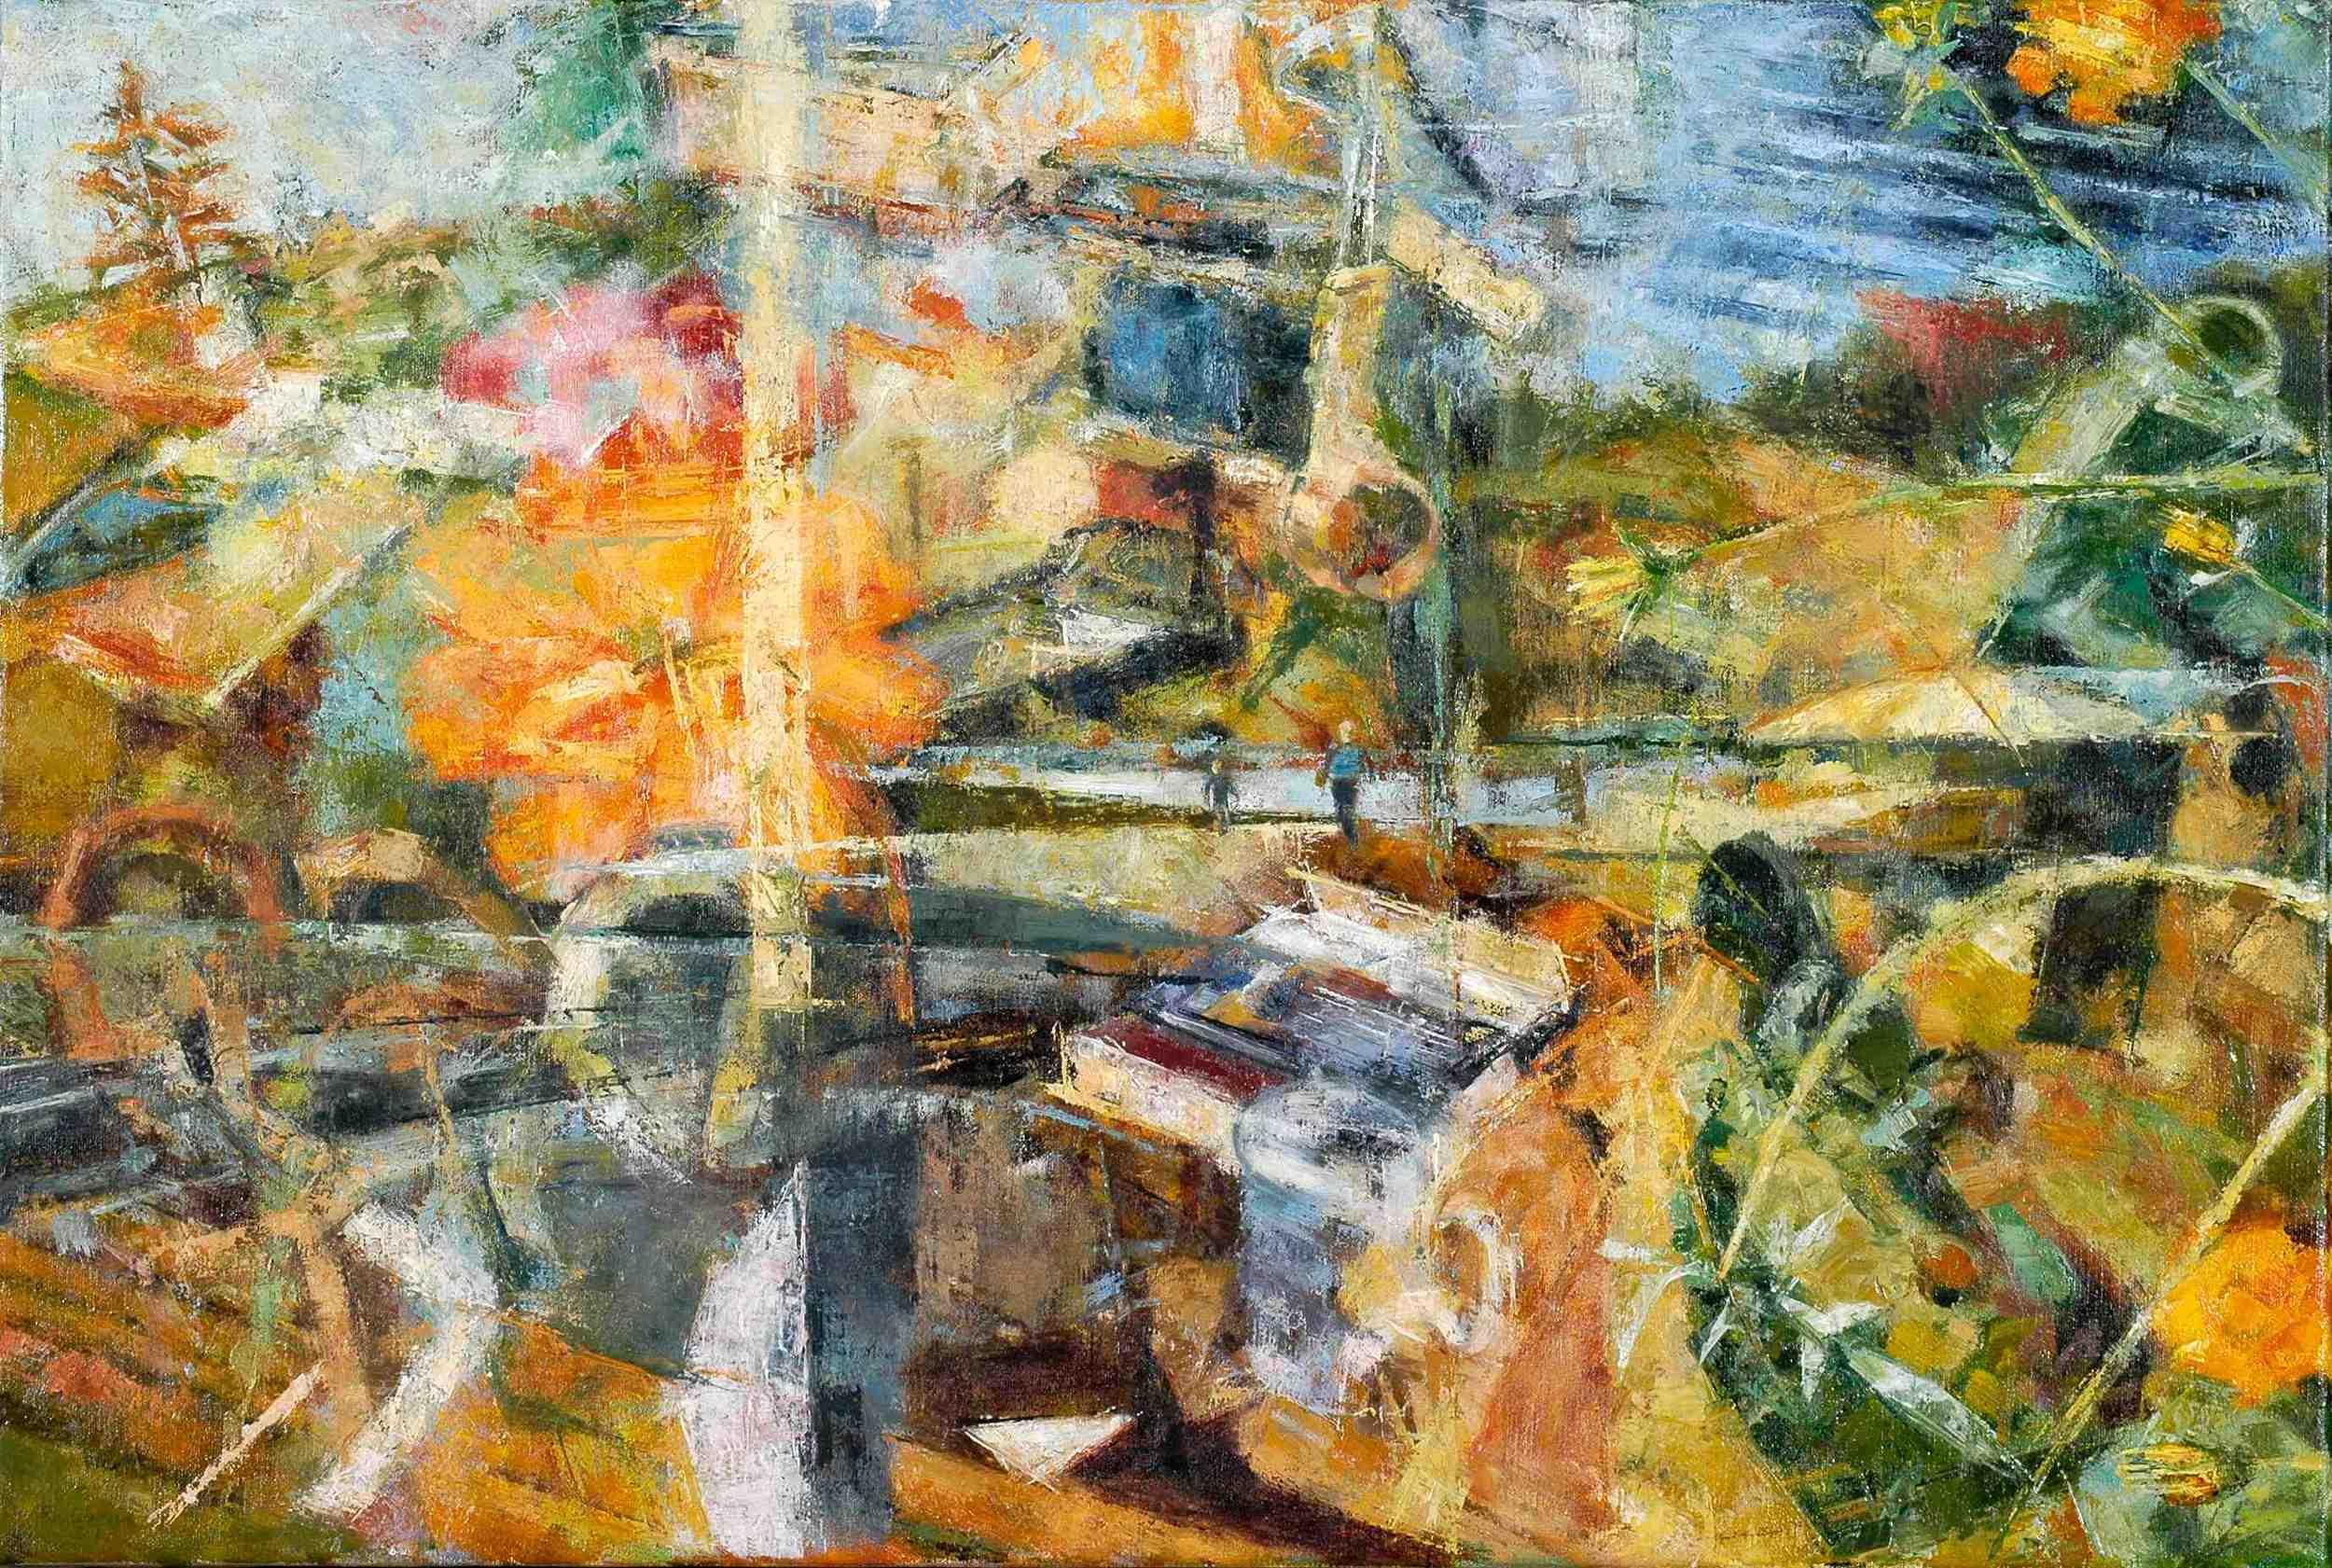 Landscape and Still Life - 2007